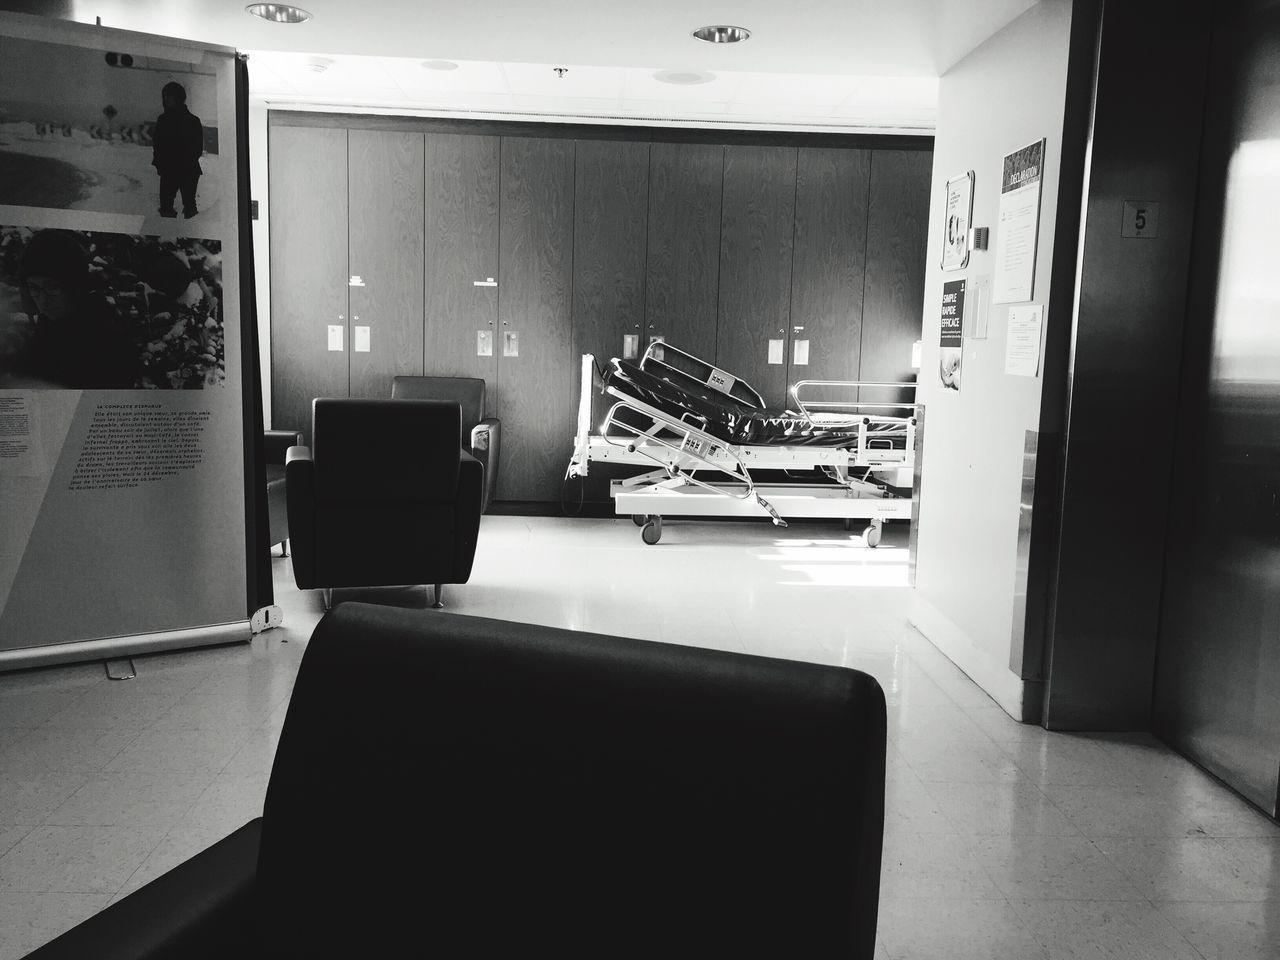 Hospital waiting room. Hospital Waiting Waiting Room Shadows & Lights Blackandwhite Black And White Montréal